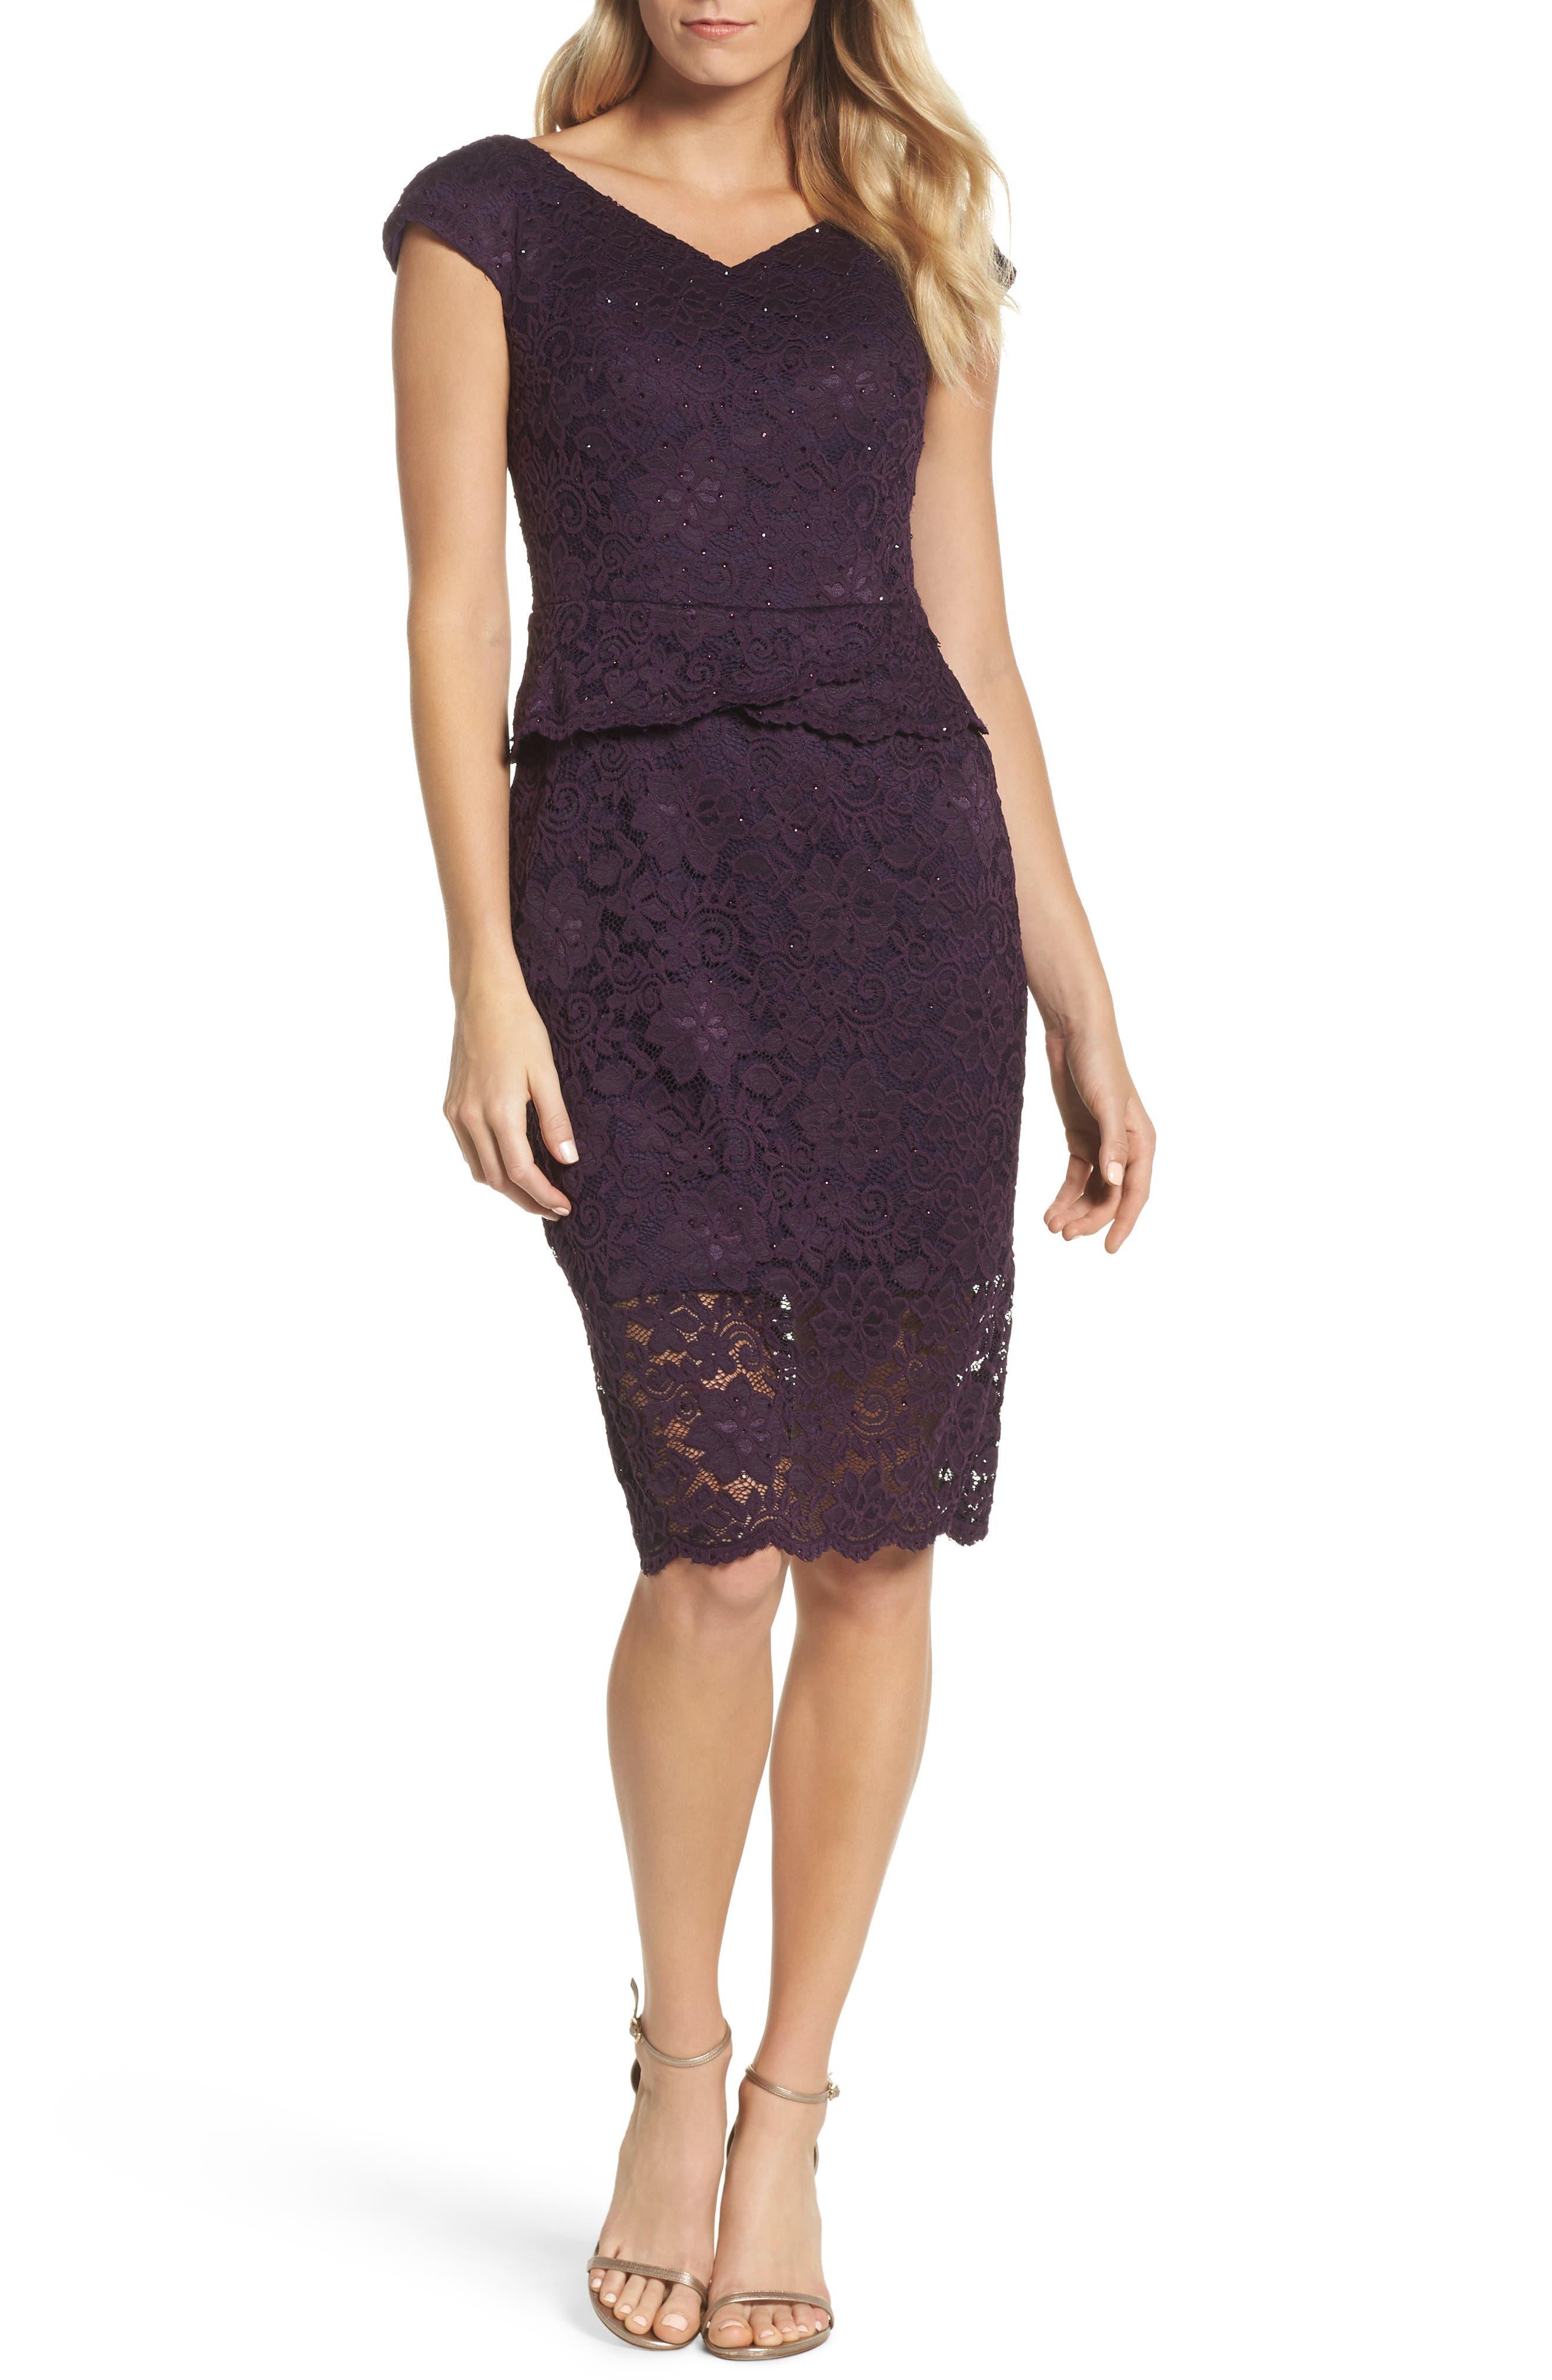 LA FEMME, Embellished Lace Sheath Dress, Main thumbnail 1, color, 501